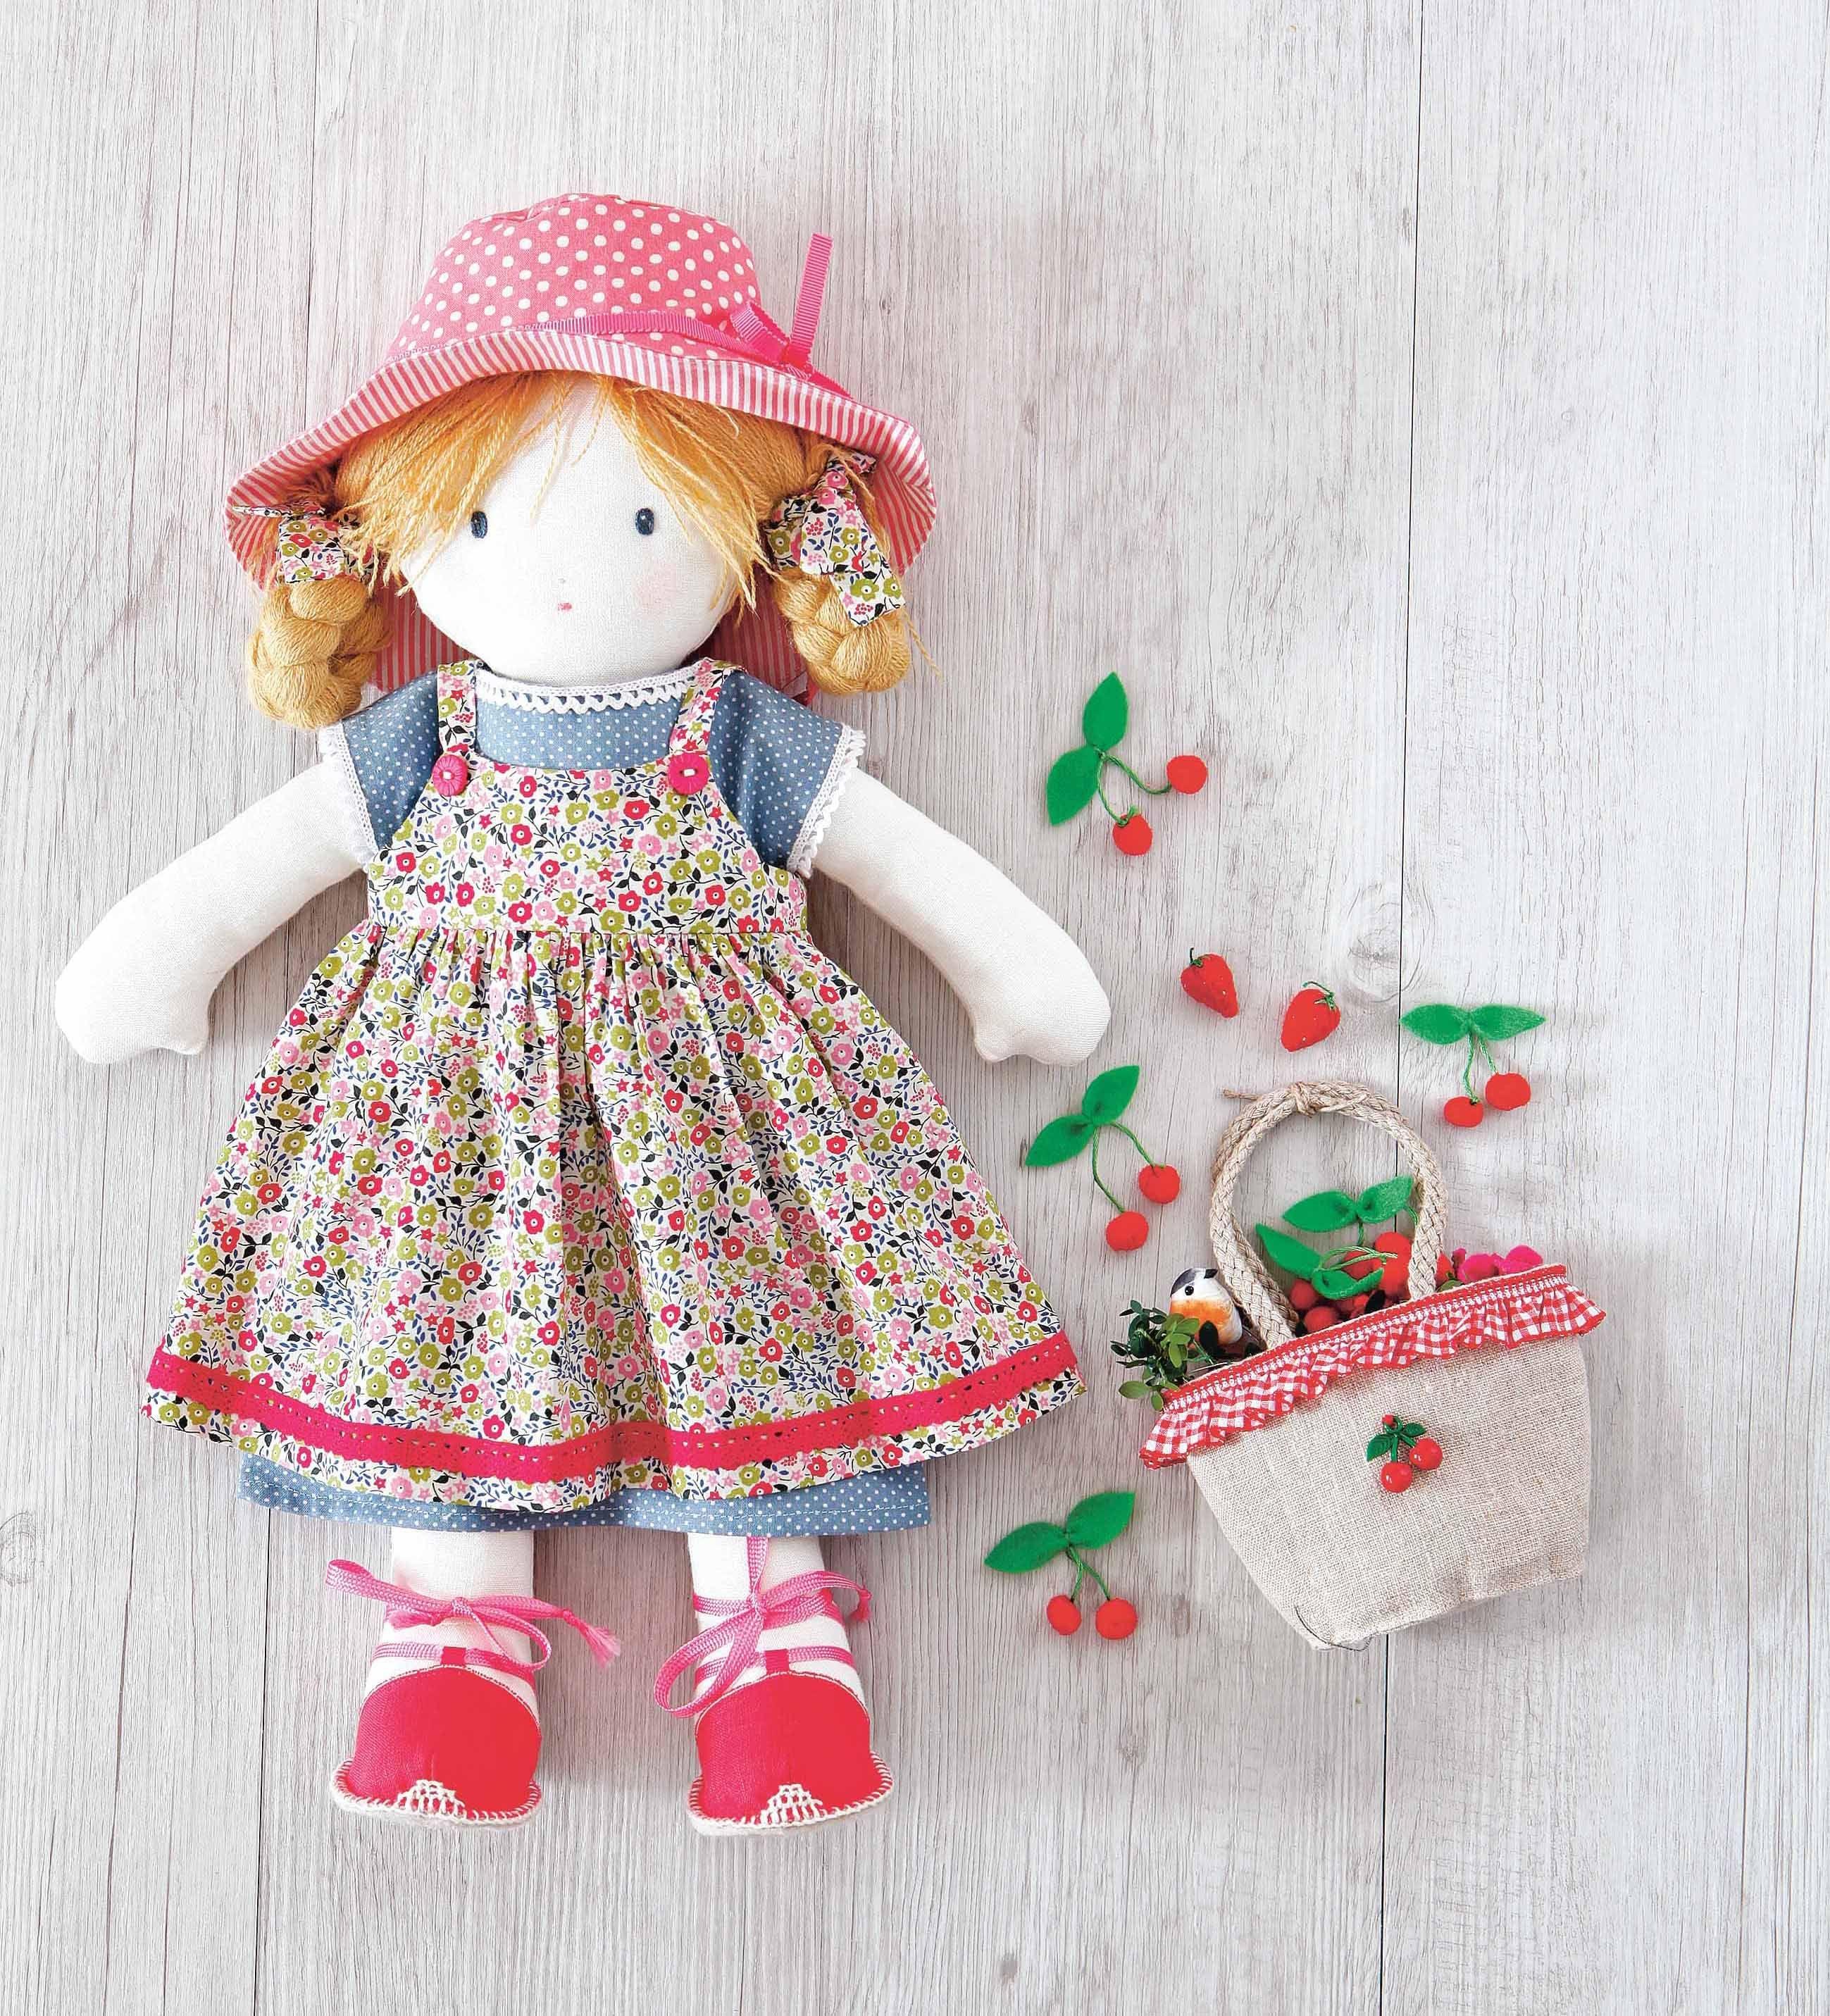 Pattern: Printable Rag Doll Sewing Pattern | Sewing | Doll Sewing - Free Printable Rag Doll Patterns